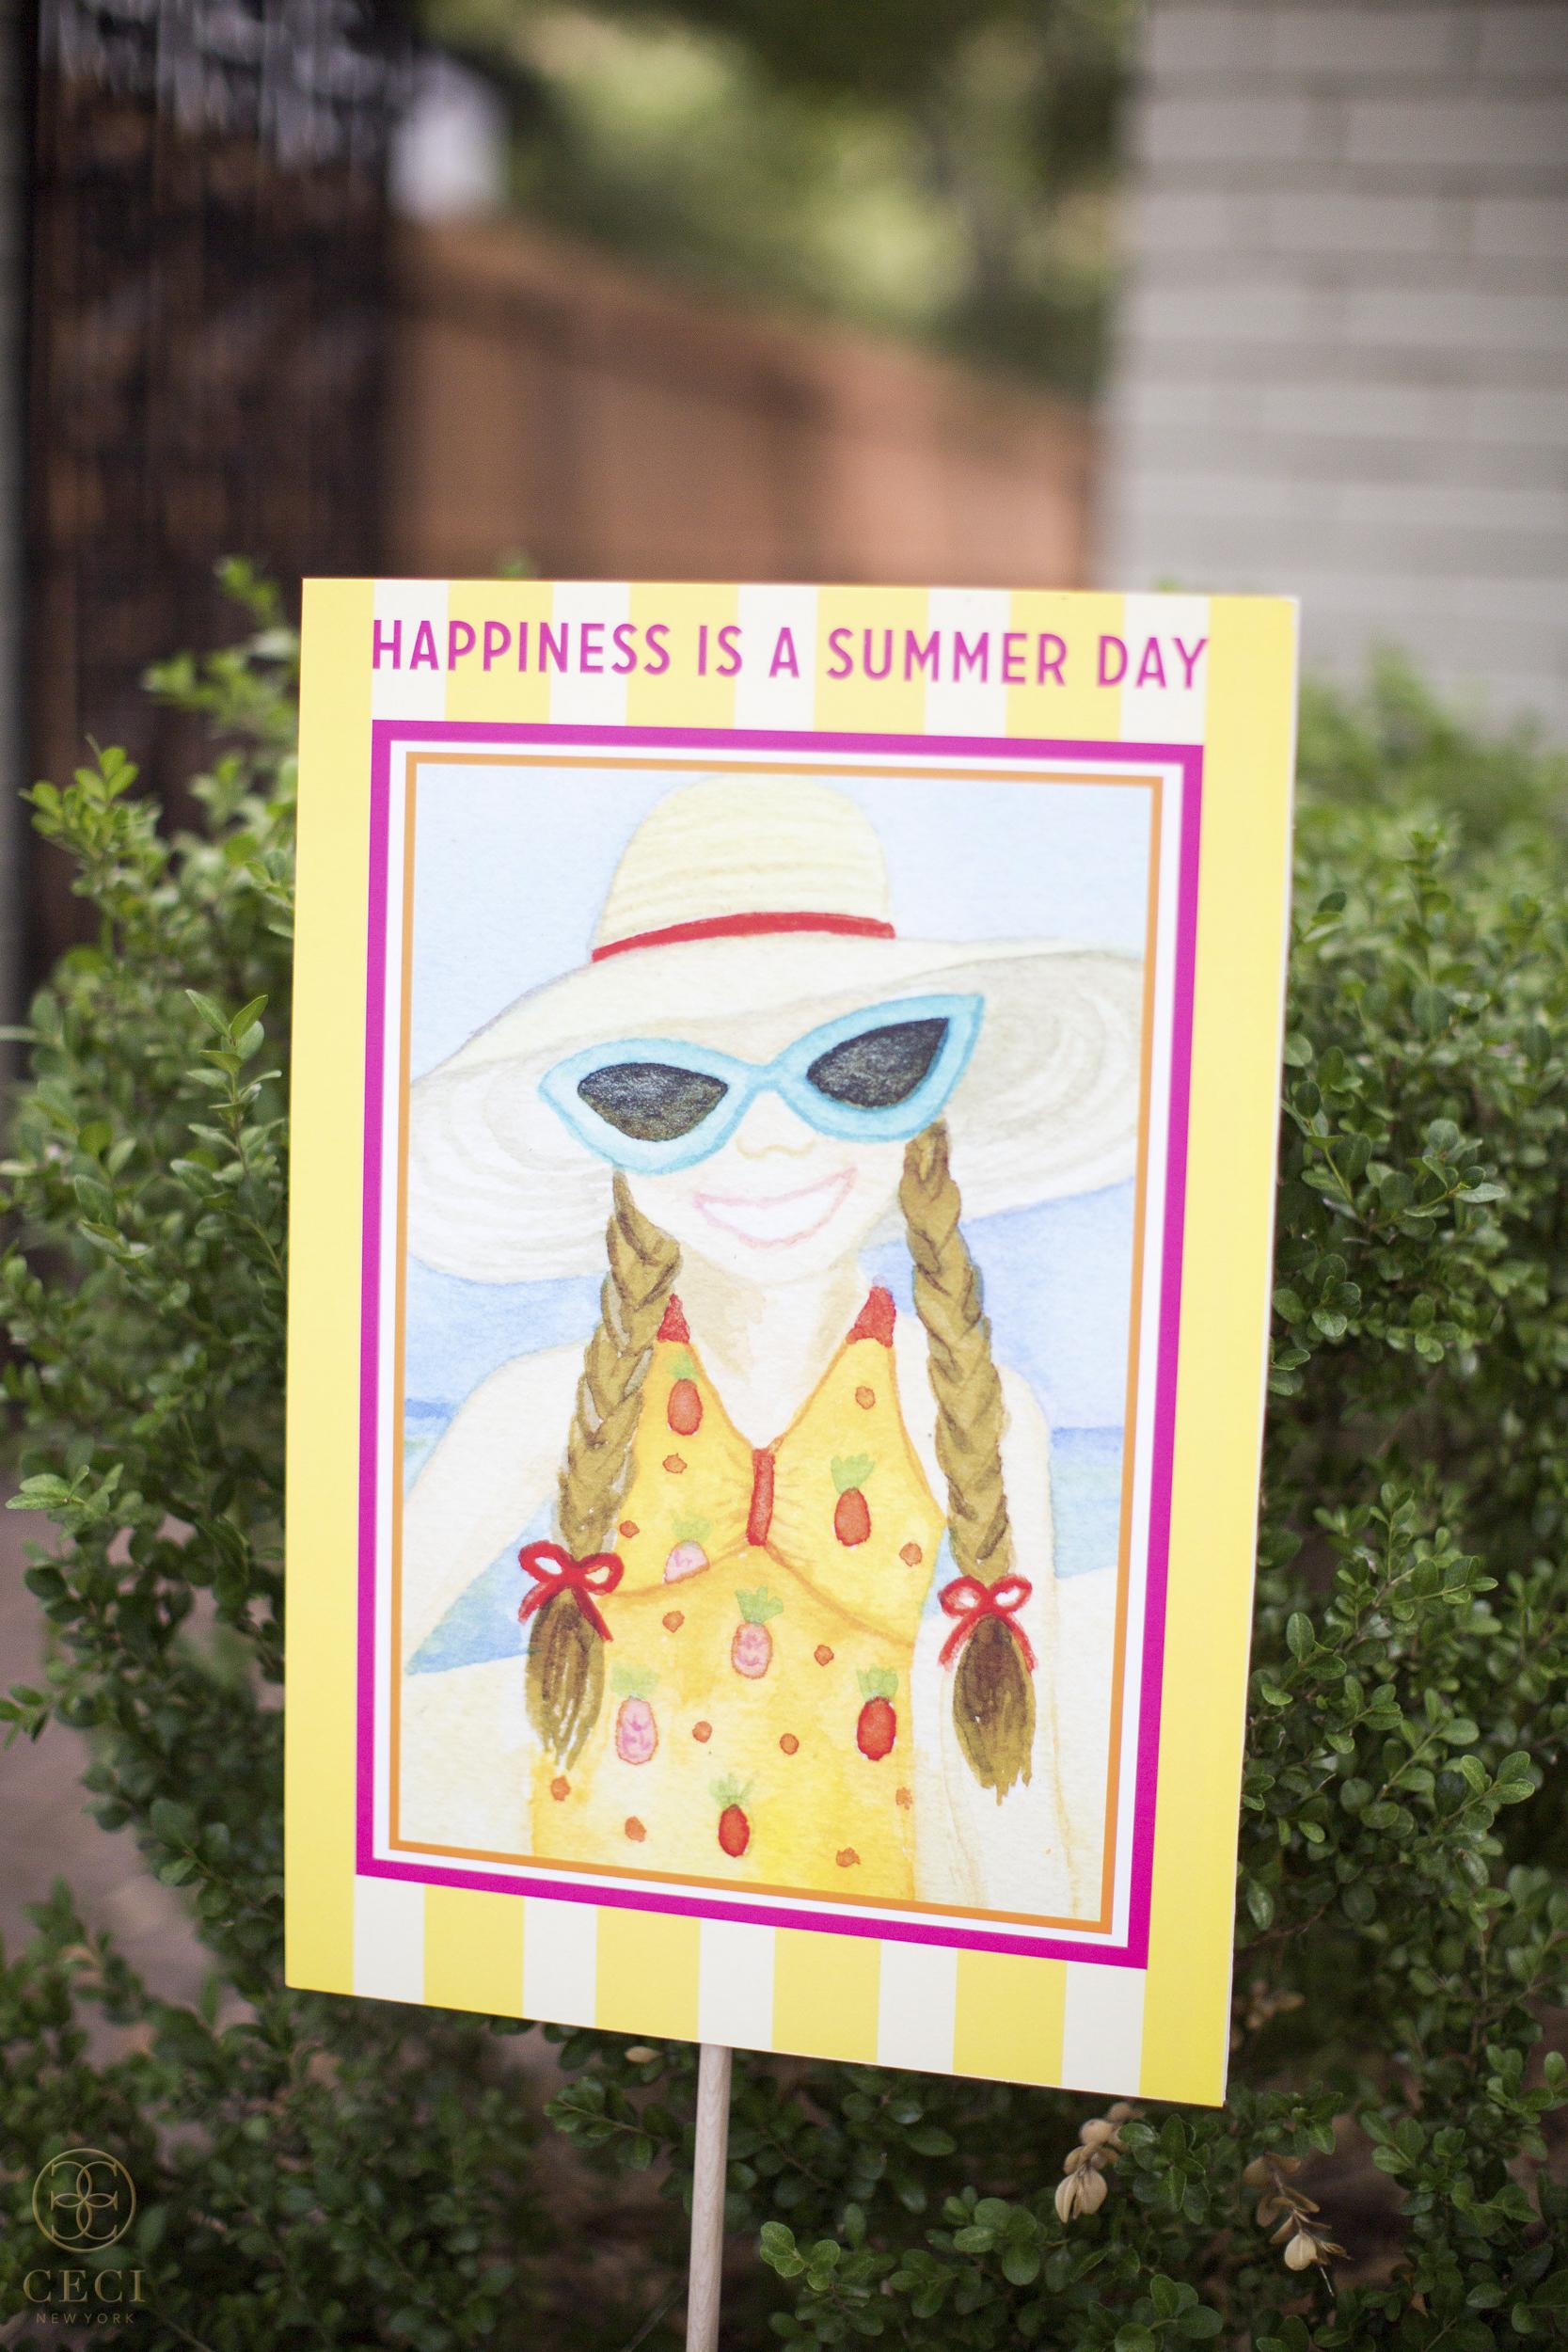 dallas_texas_birthday_party_mae_emily_clarke_events_kids_retro_pool_swim_endless_summer_invitations_ceci_new_york_watercolor_illustration_decor_design_boxes_favors-1.jpg